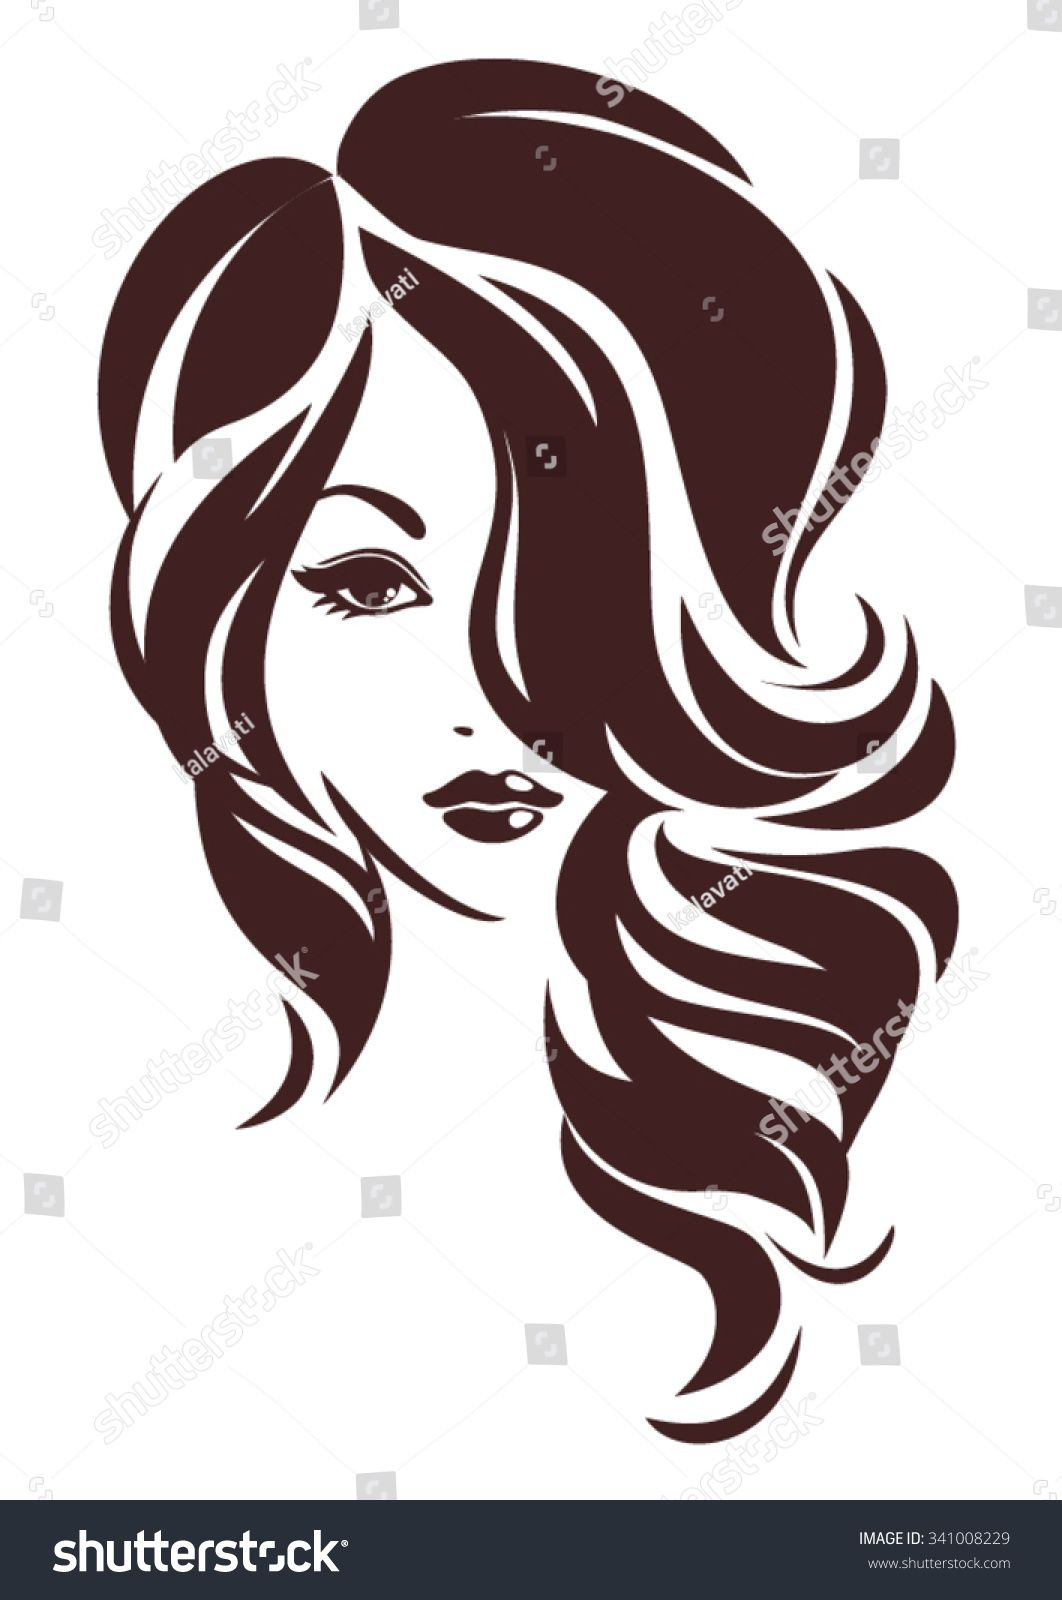 Girl with hair loose, vector logo design bichos in 2019